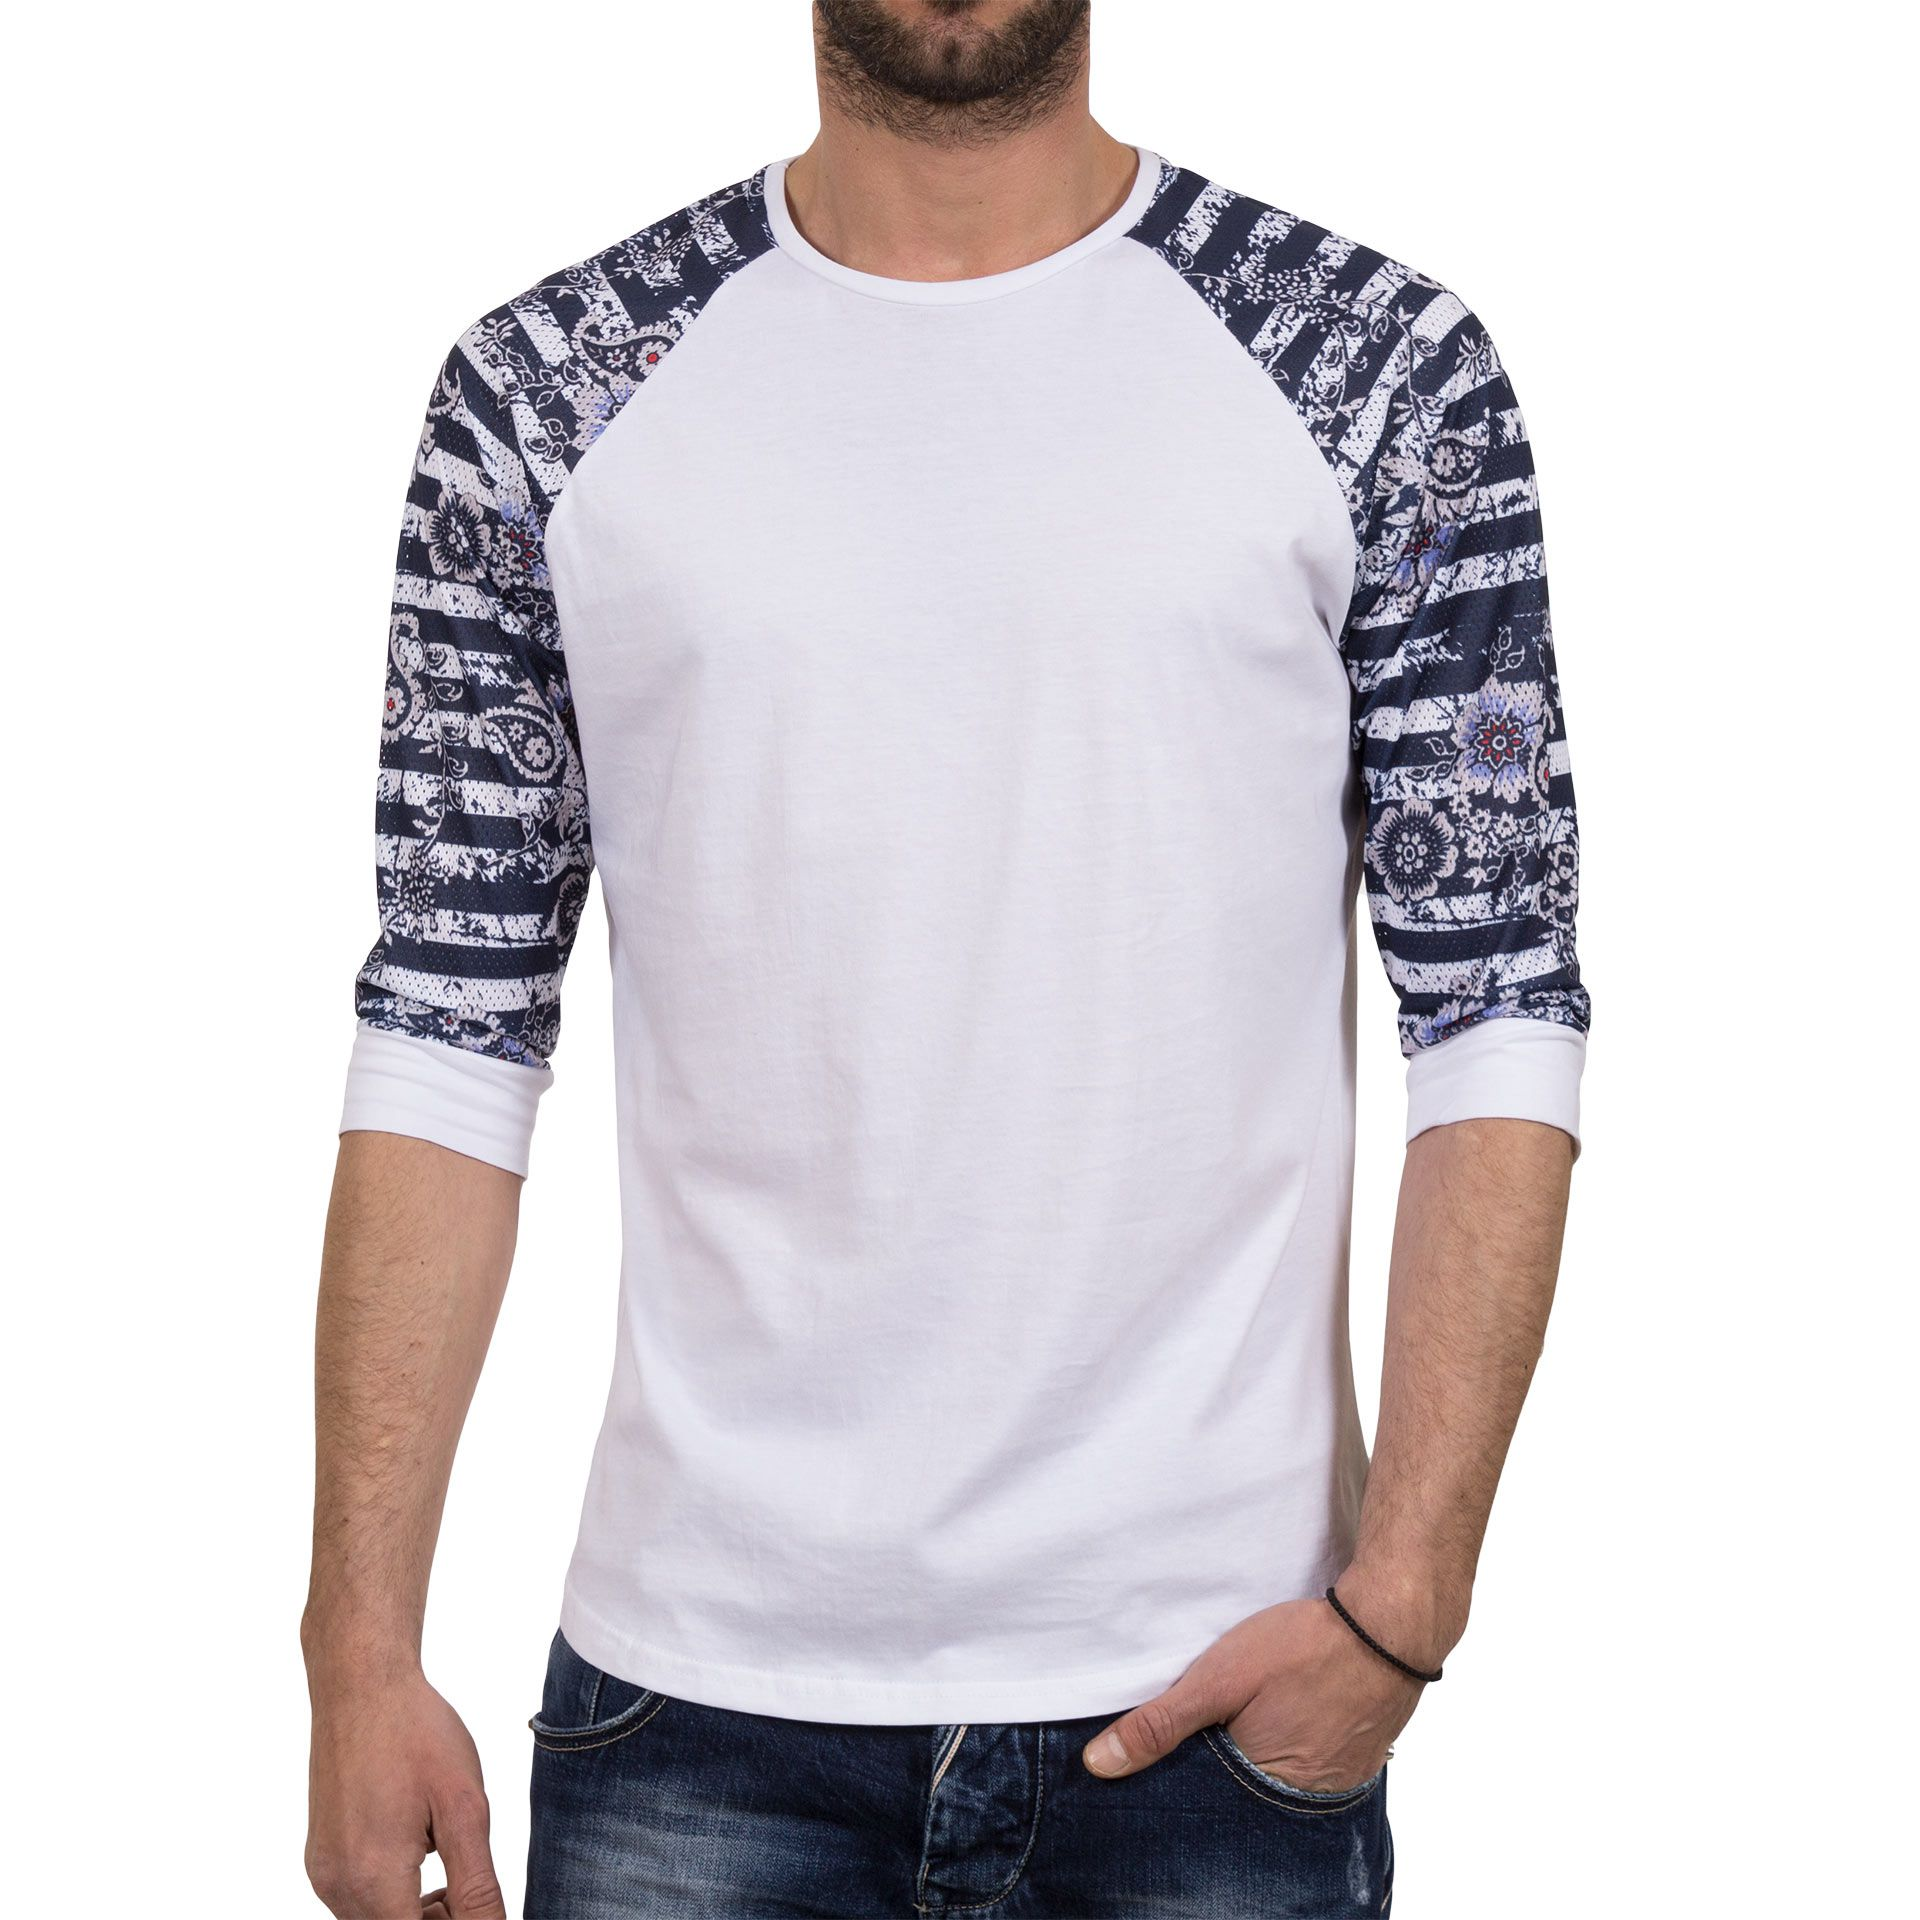 72b73765b18c Ανδρική μπλούζα T-Shirt FreeWave 71109 Άσπρο